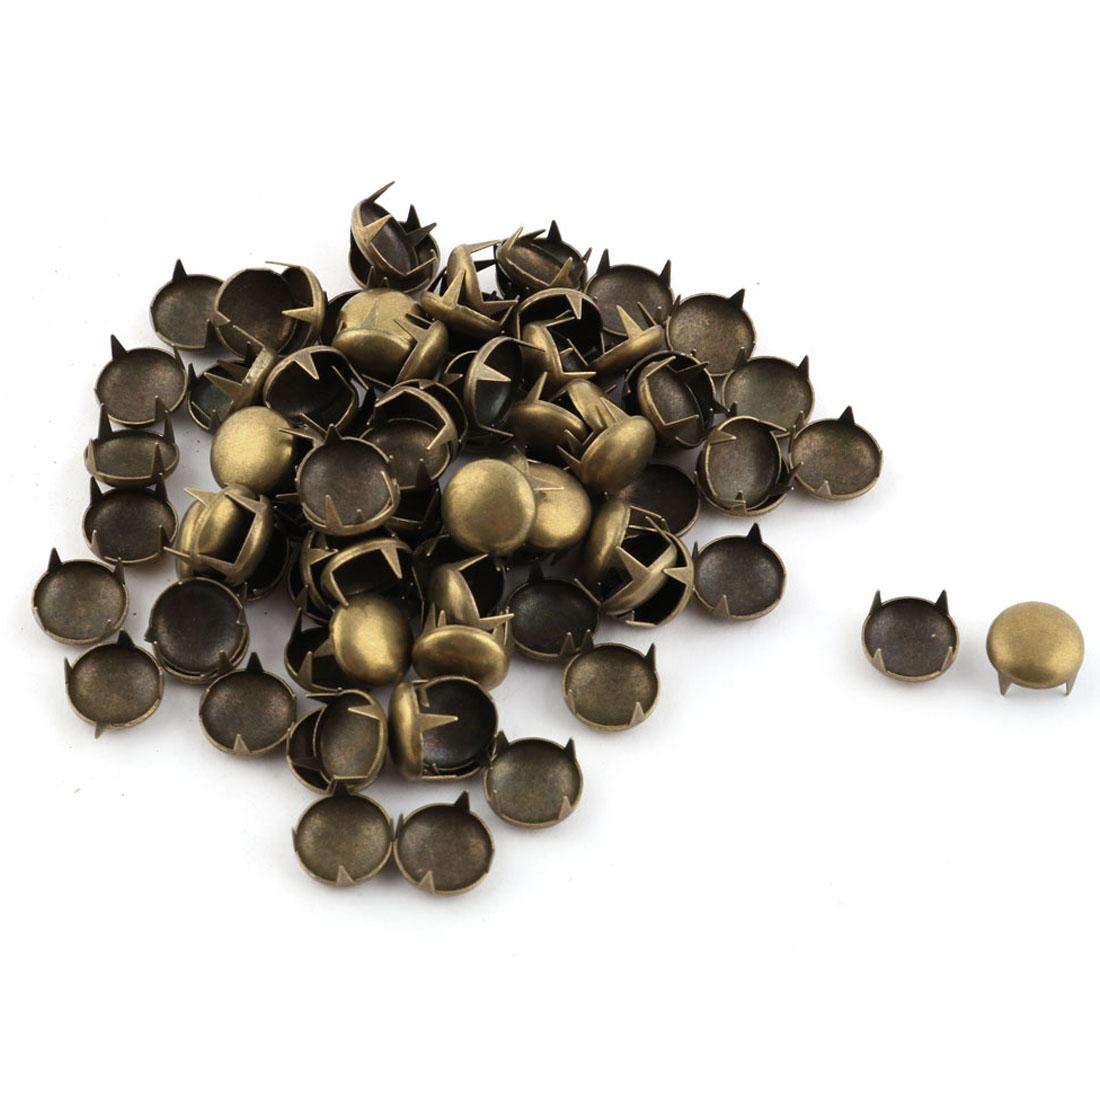 Metal Round Shaped Head DIY Rivet Studs Bronze Tone 10mm 100pcs for Clothing Bag